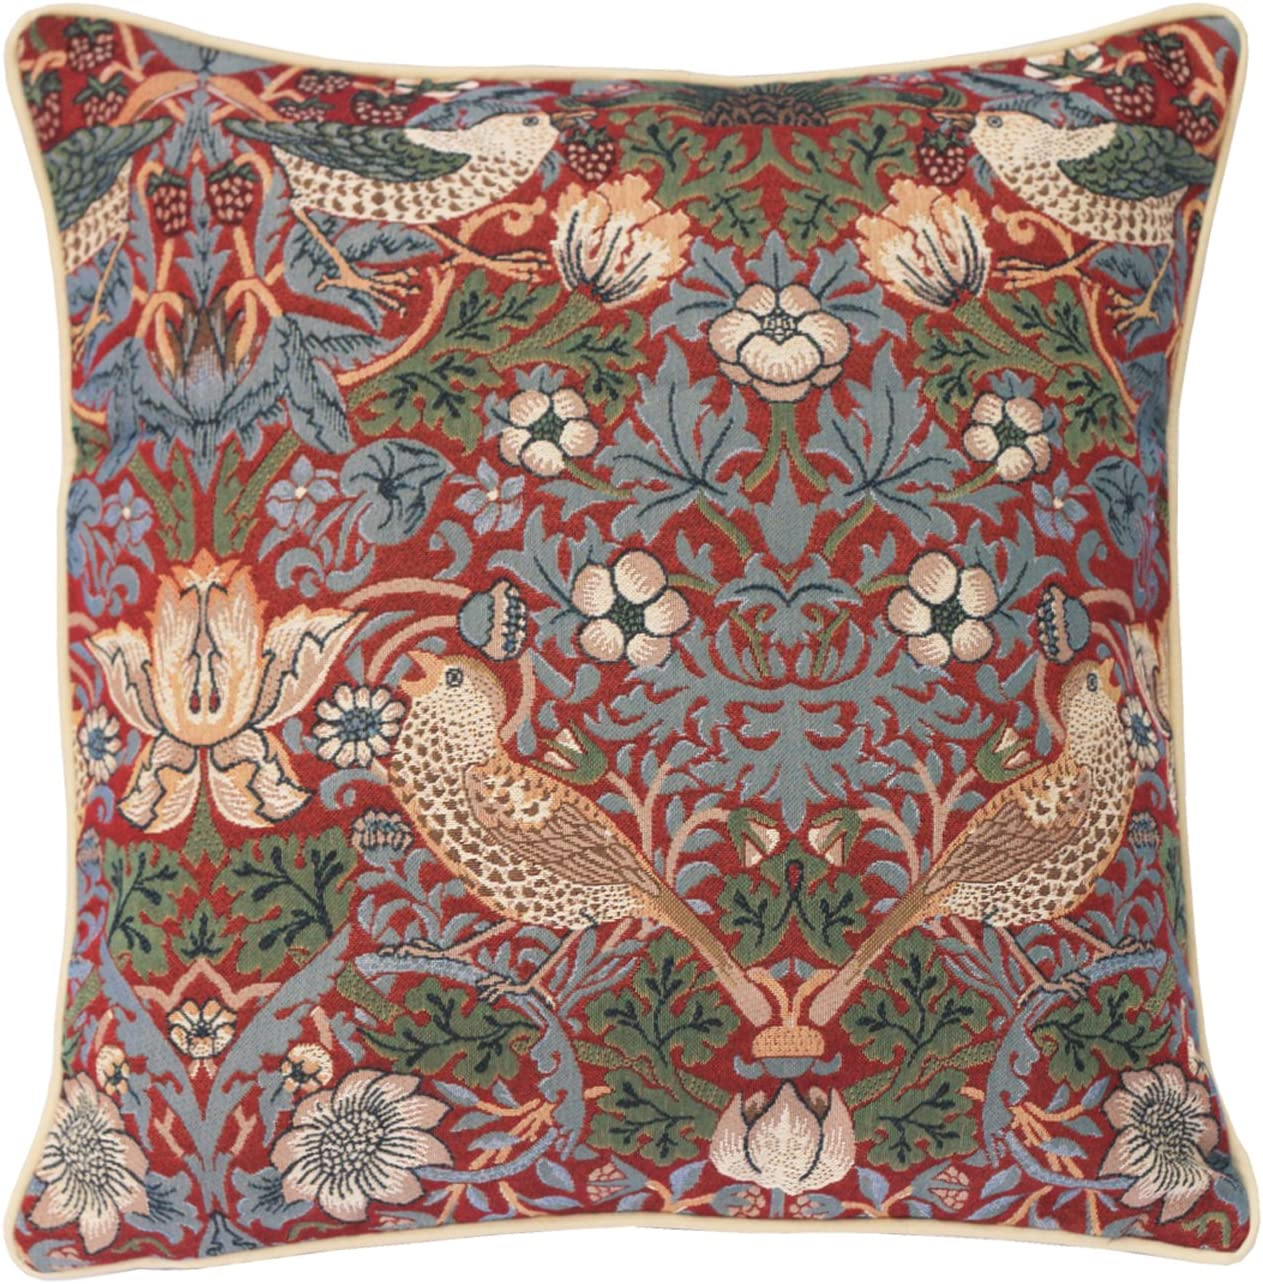 Amazon Com Signare Red Floral William Morris Cushion Cover Designer Decorative Sofa Couch Pillow 45x45 Cm Strawberry Thief Ccov Strd Home Kitchen